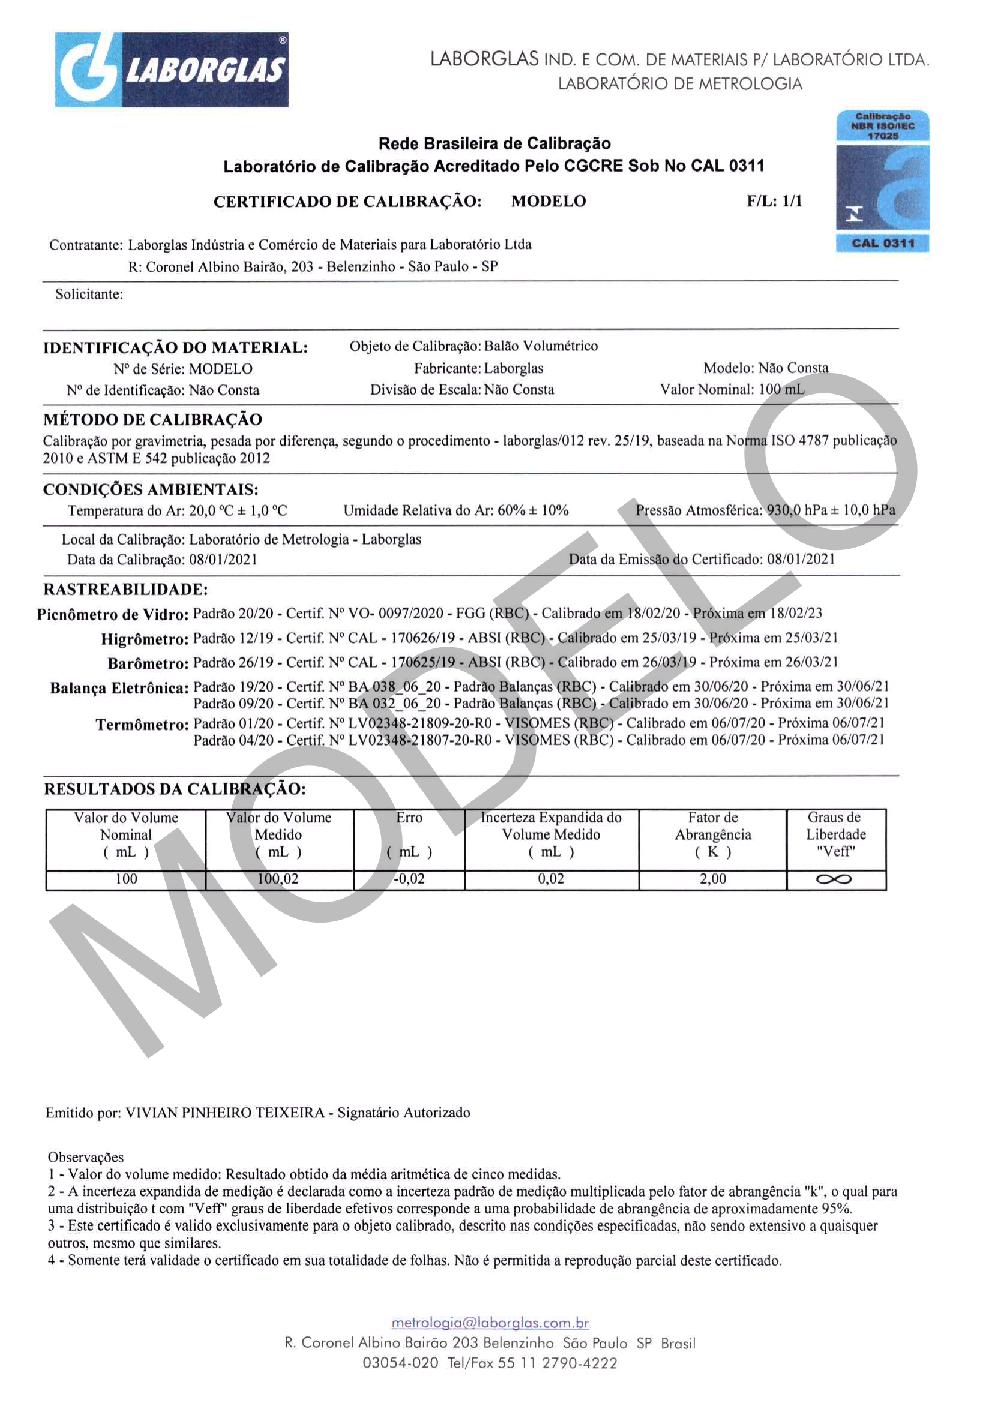 BALÃO VOLUMÉTRICO CLASSE A ROLHA POLI C/ CERTIFICADO RBC 2,5 ML - Marca Laborglas - Cód. 9167803-R